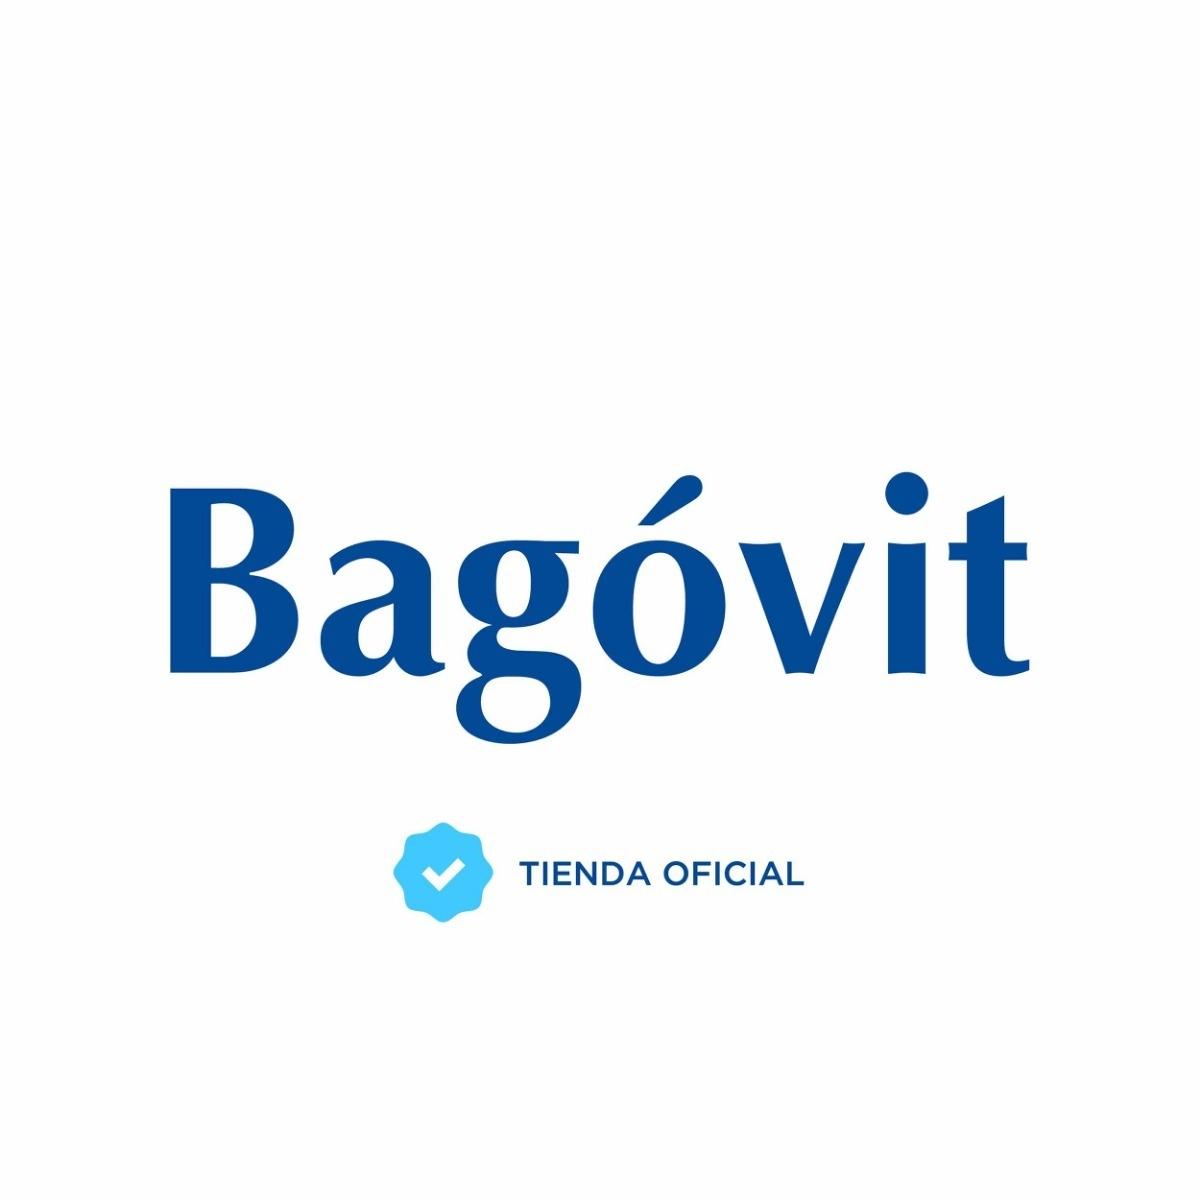 Bagóvit